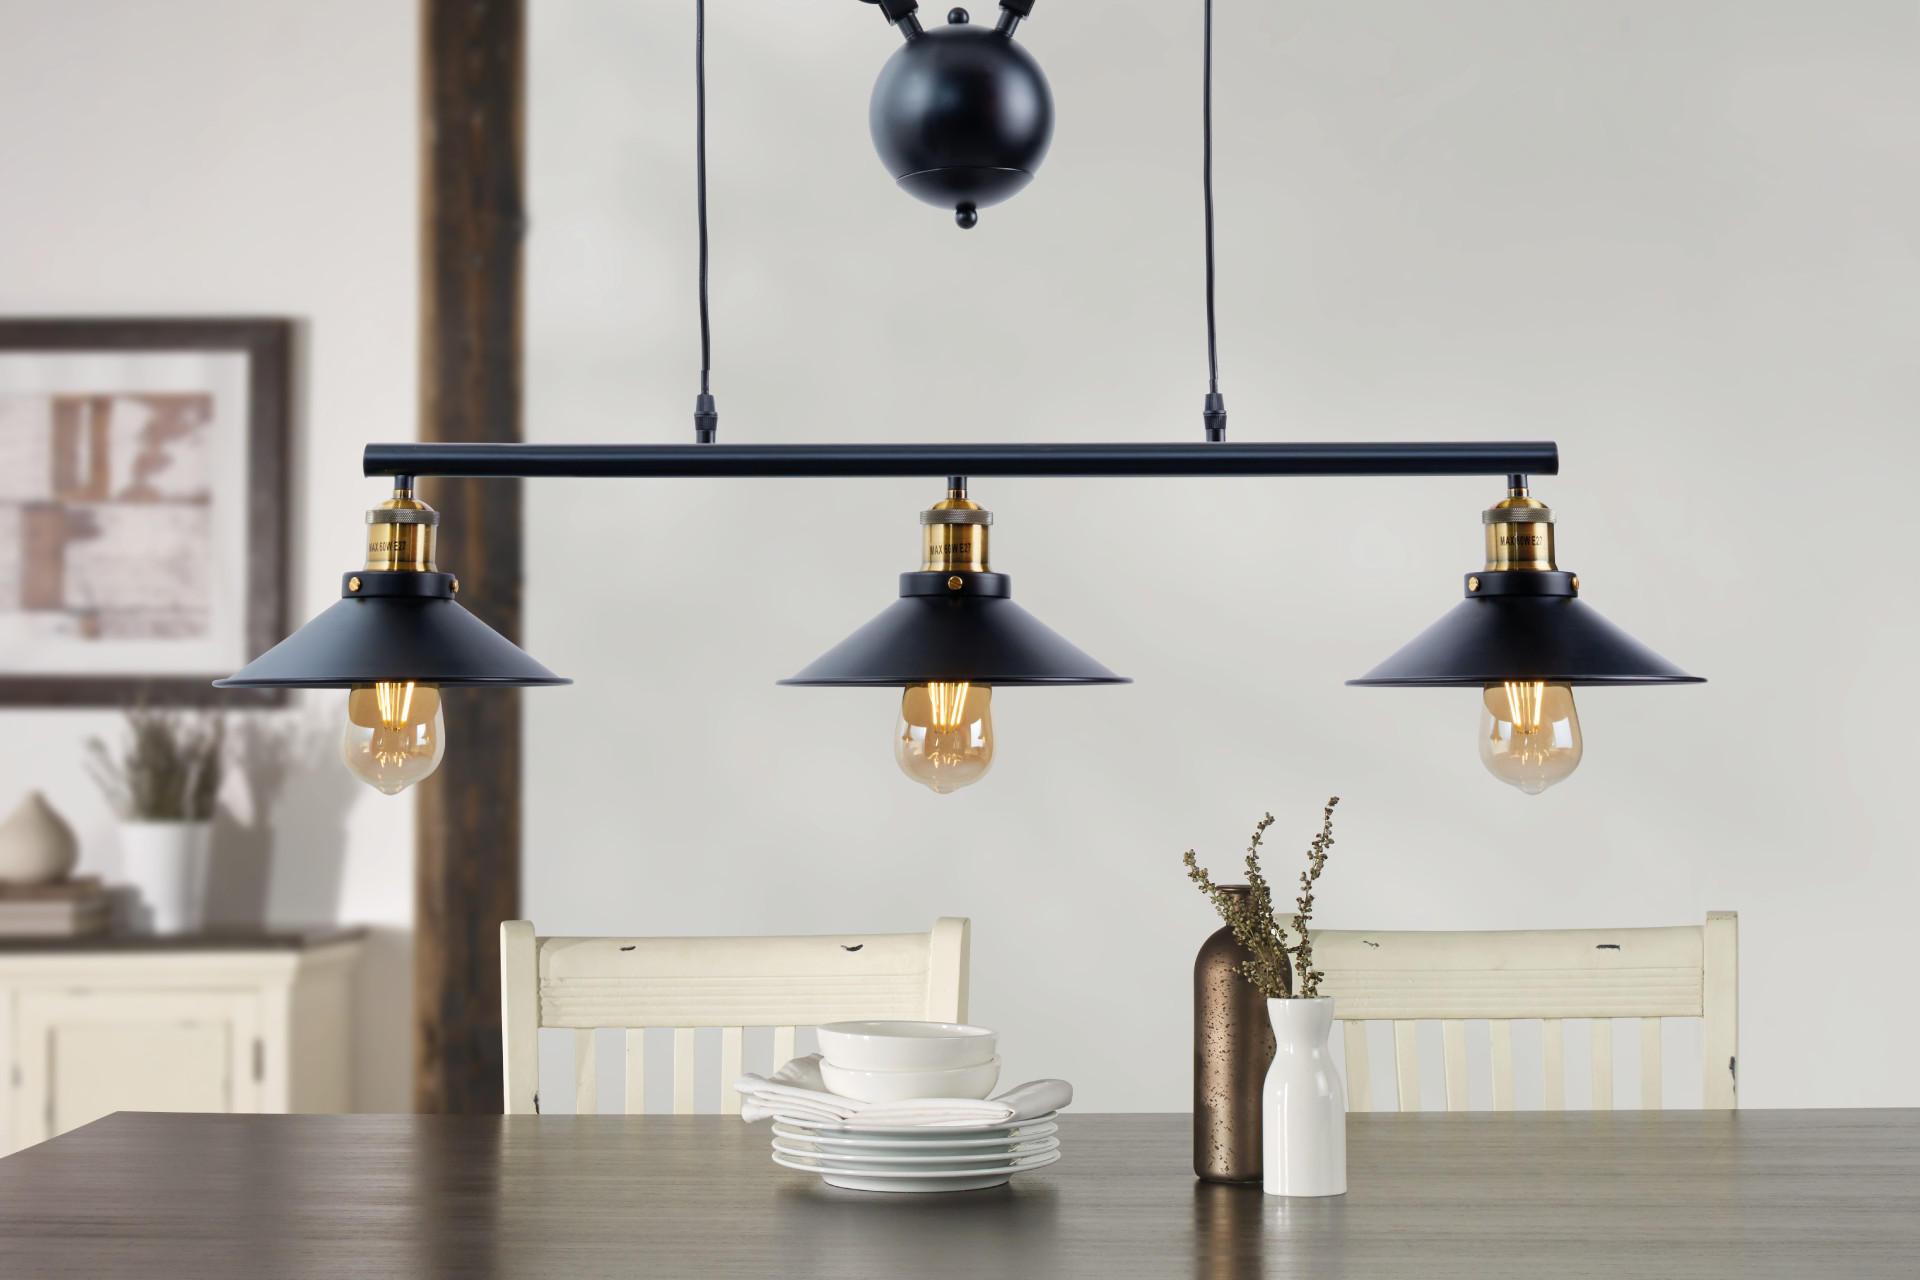 LED Decken Leuchte GOLD Farben Ess-Zimmer Strahler Spot Flur Küchen Lampe Metall